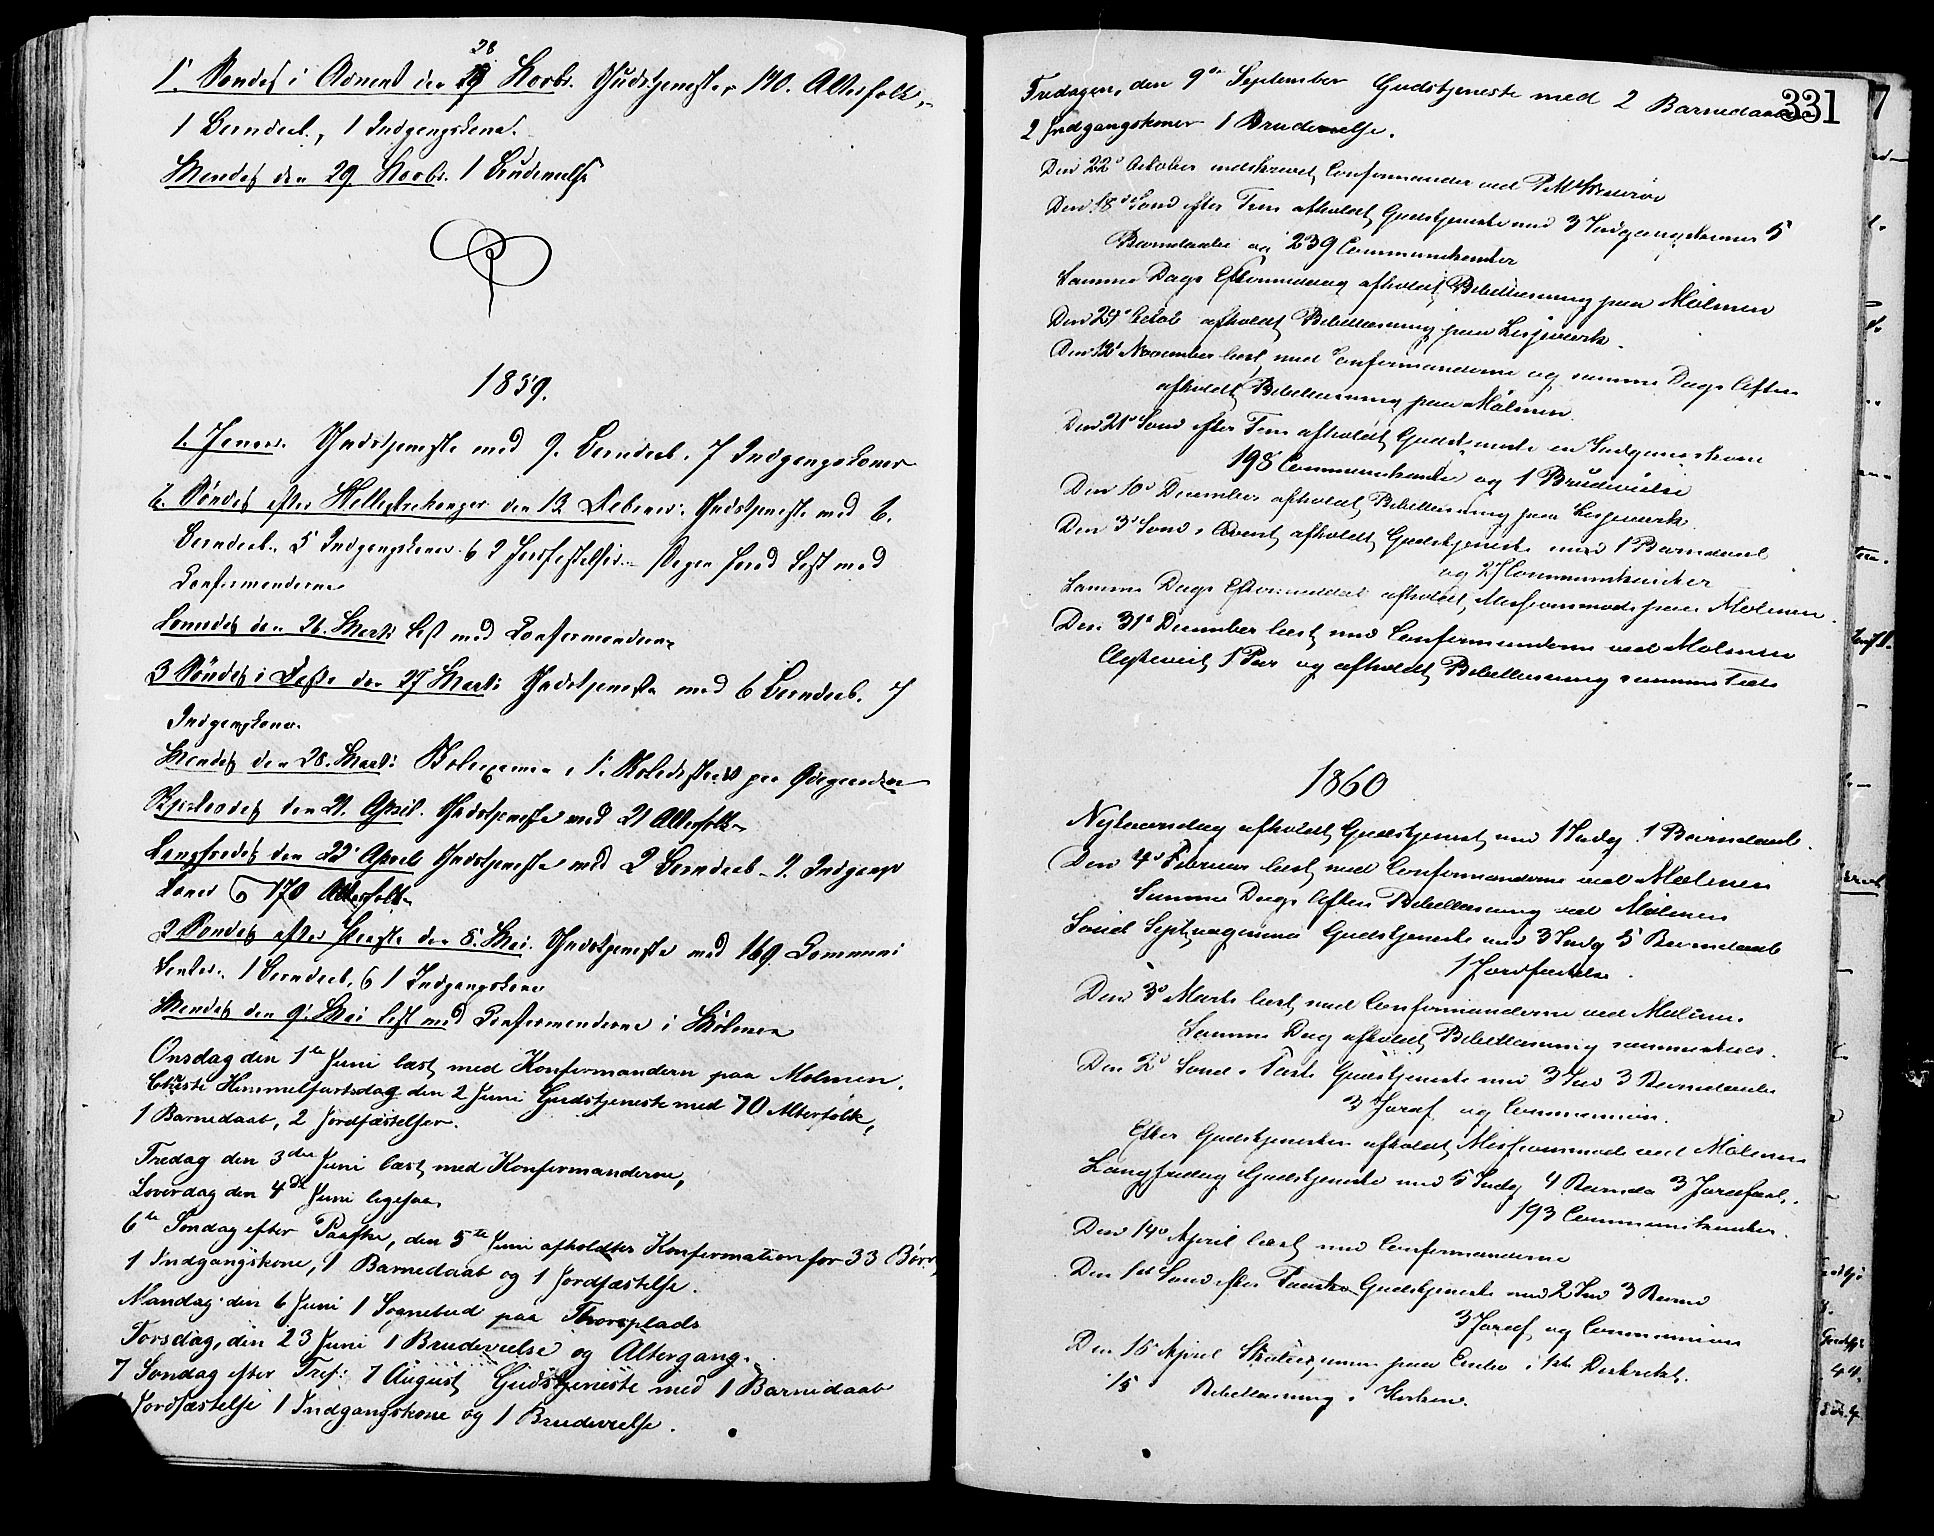 SAH, Lesja prestekontor, Ministerialbok nr. 9, 1854-1889, s. 331